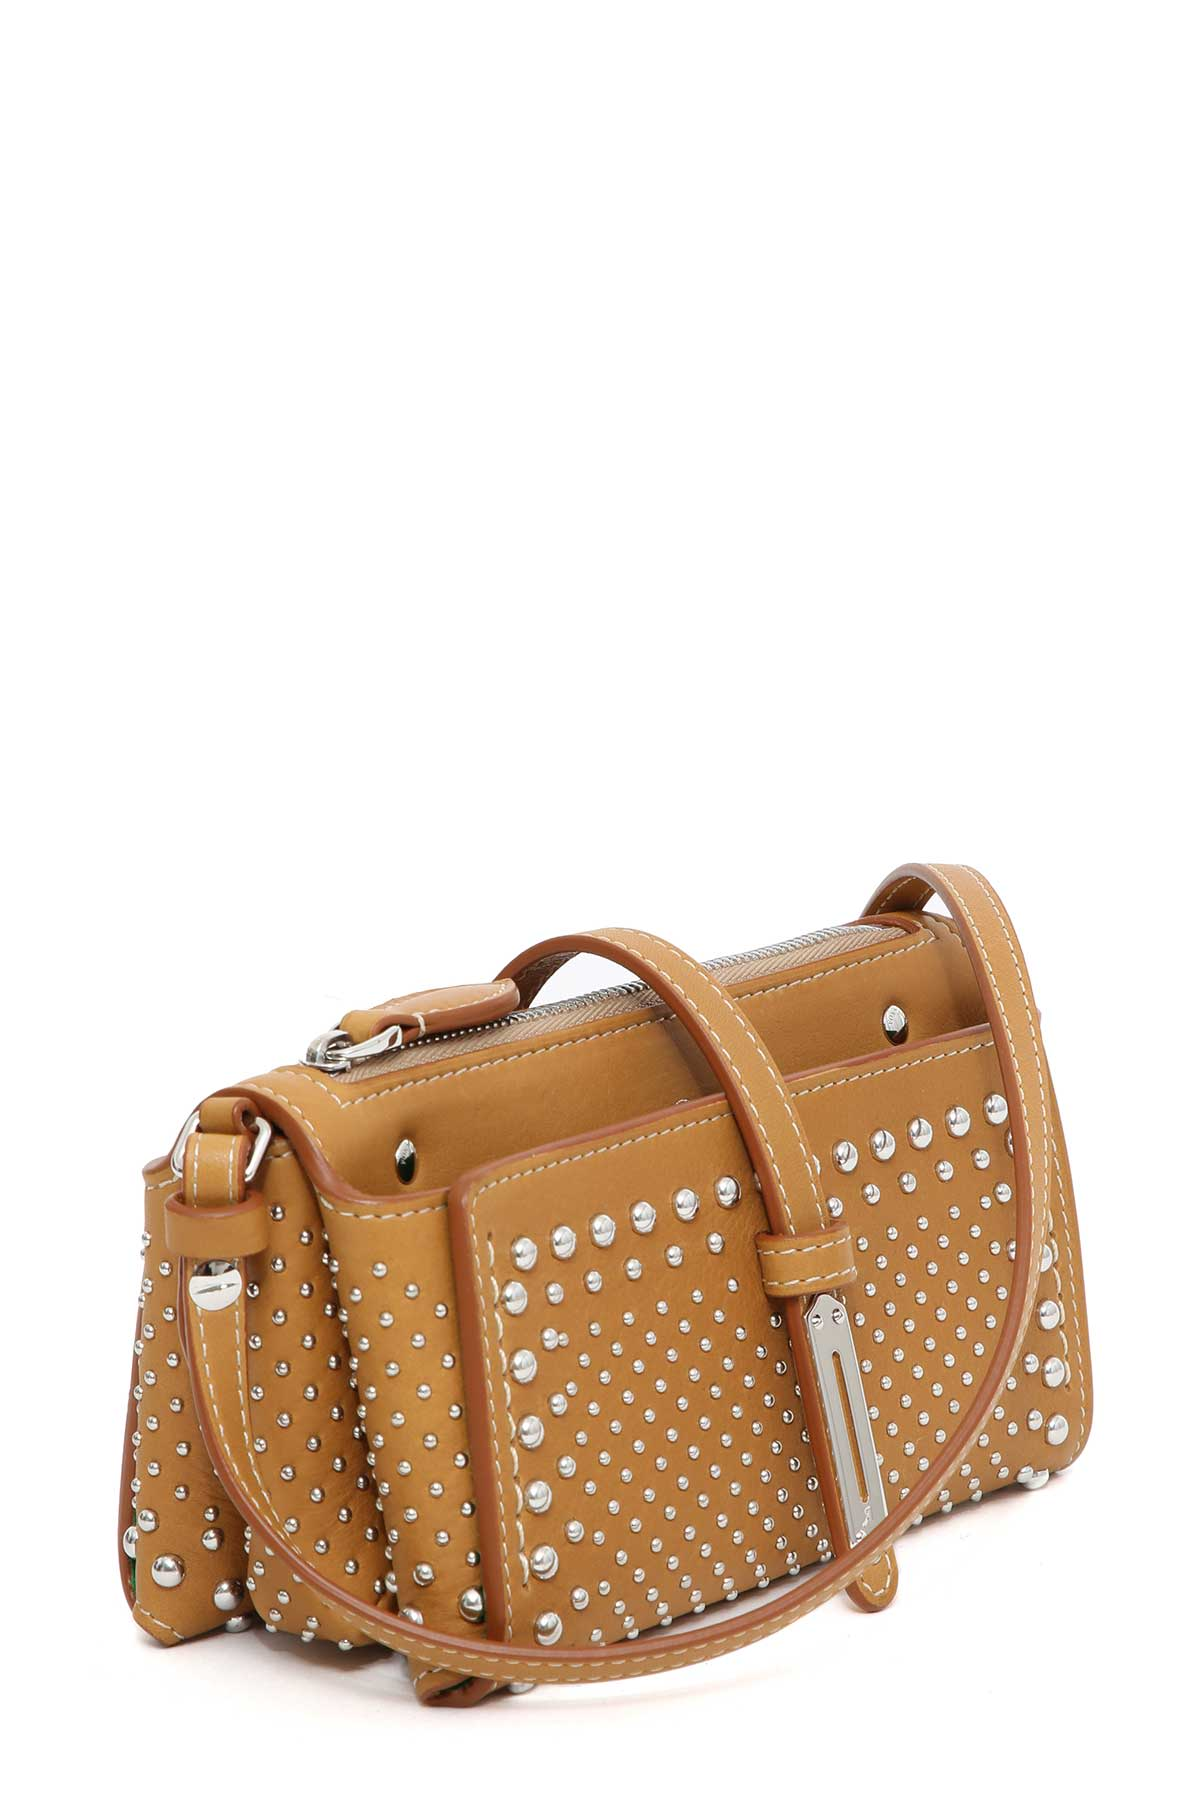 Fontana Couture 'a' Mini Cosmos Shoulder Bag